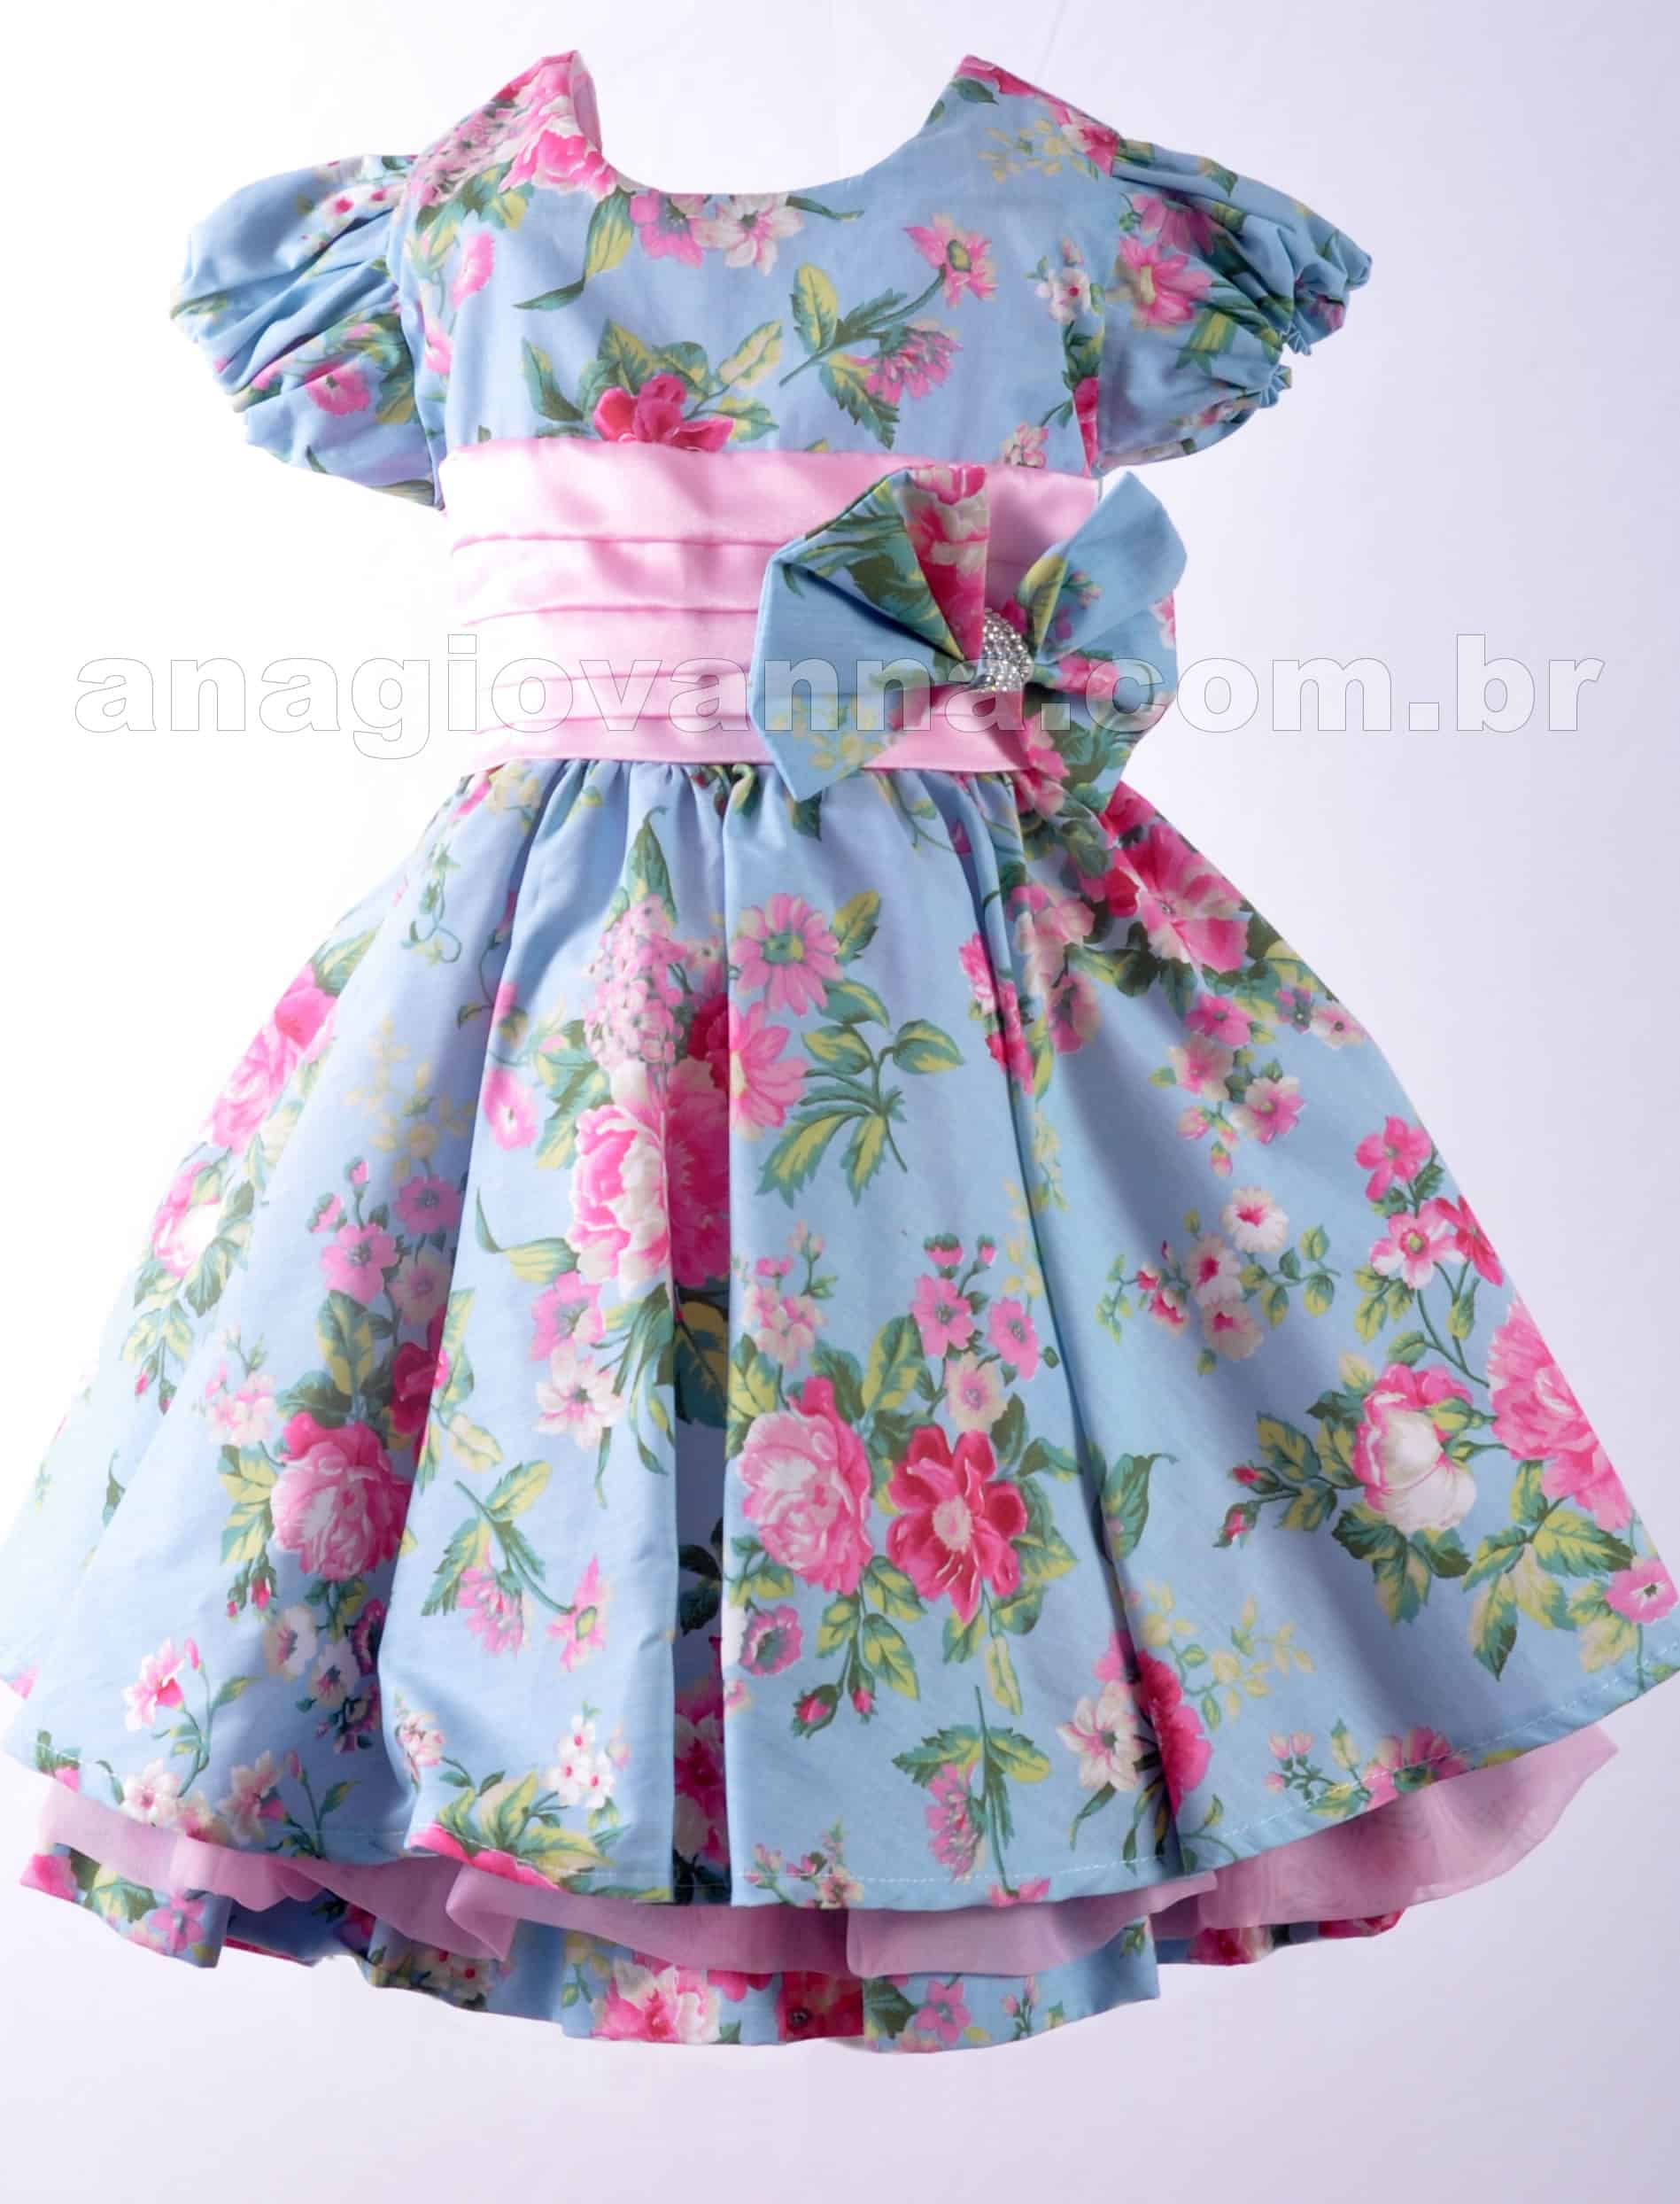 7534b79f22 vestido de festa infantil Archives - Blog Ana Giovanna